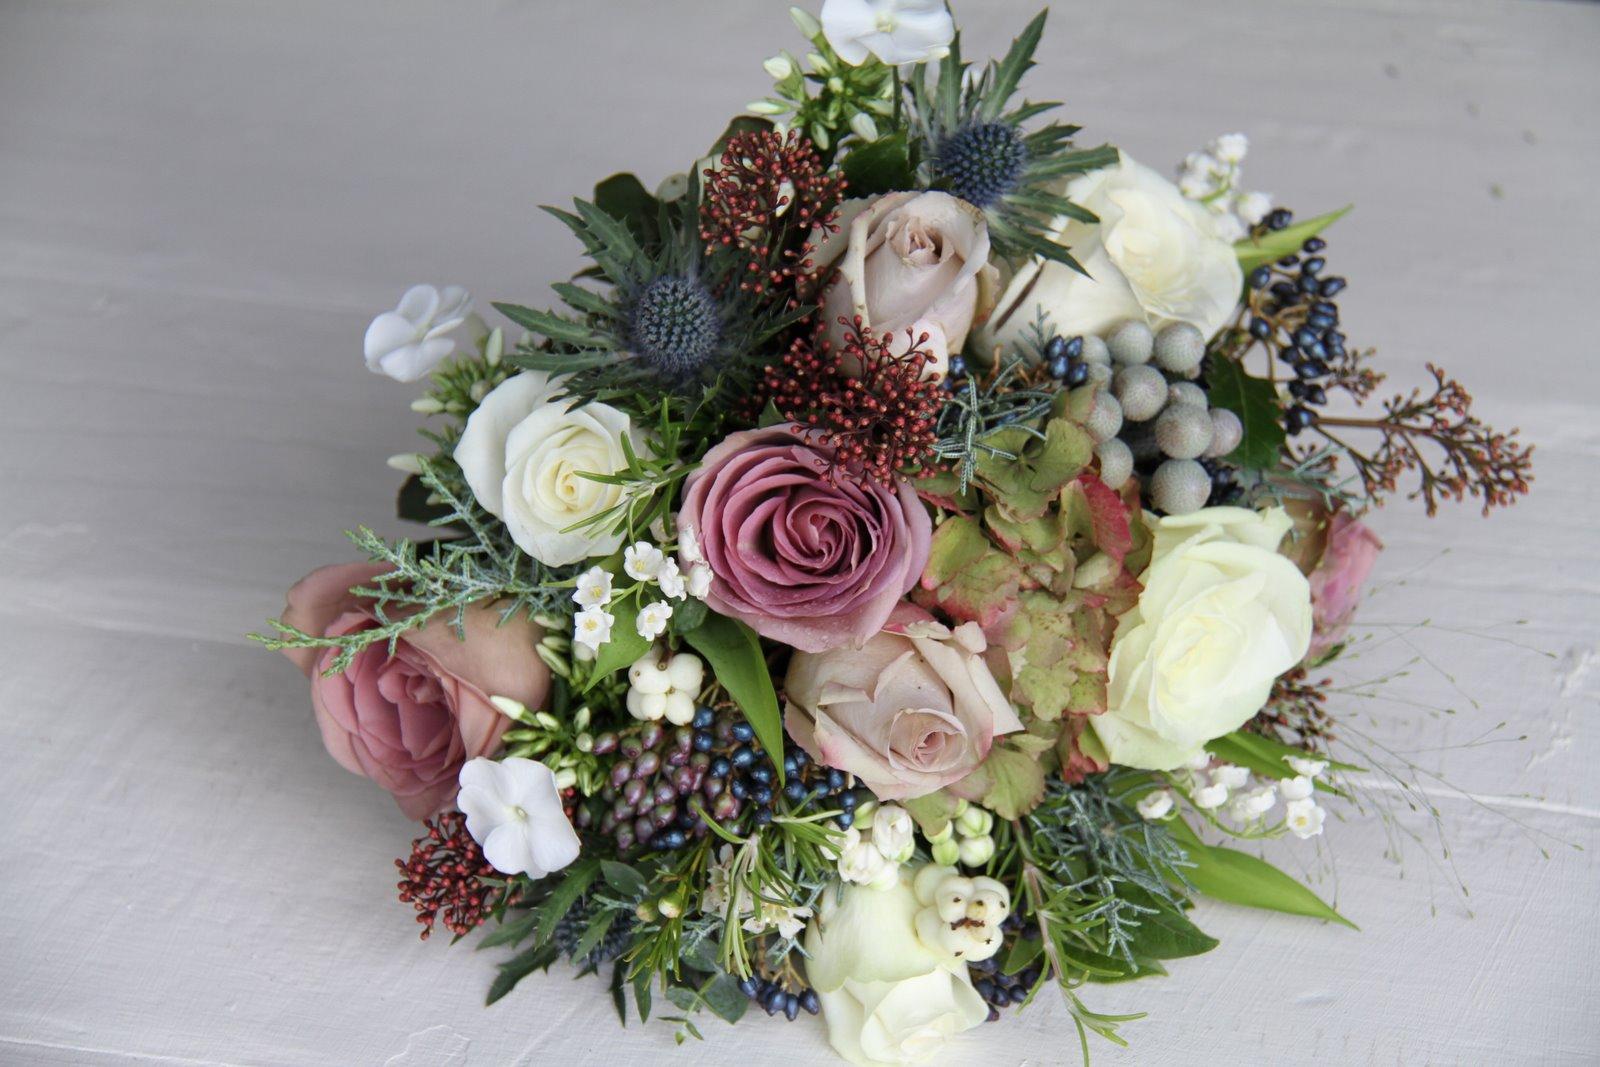 The Flower Magician Vintage Winter Berry Bouquet